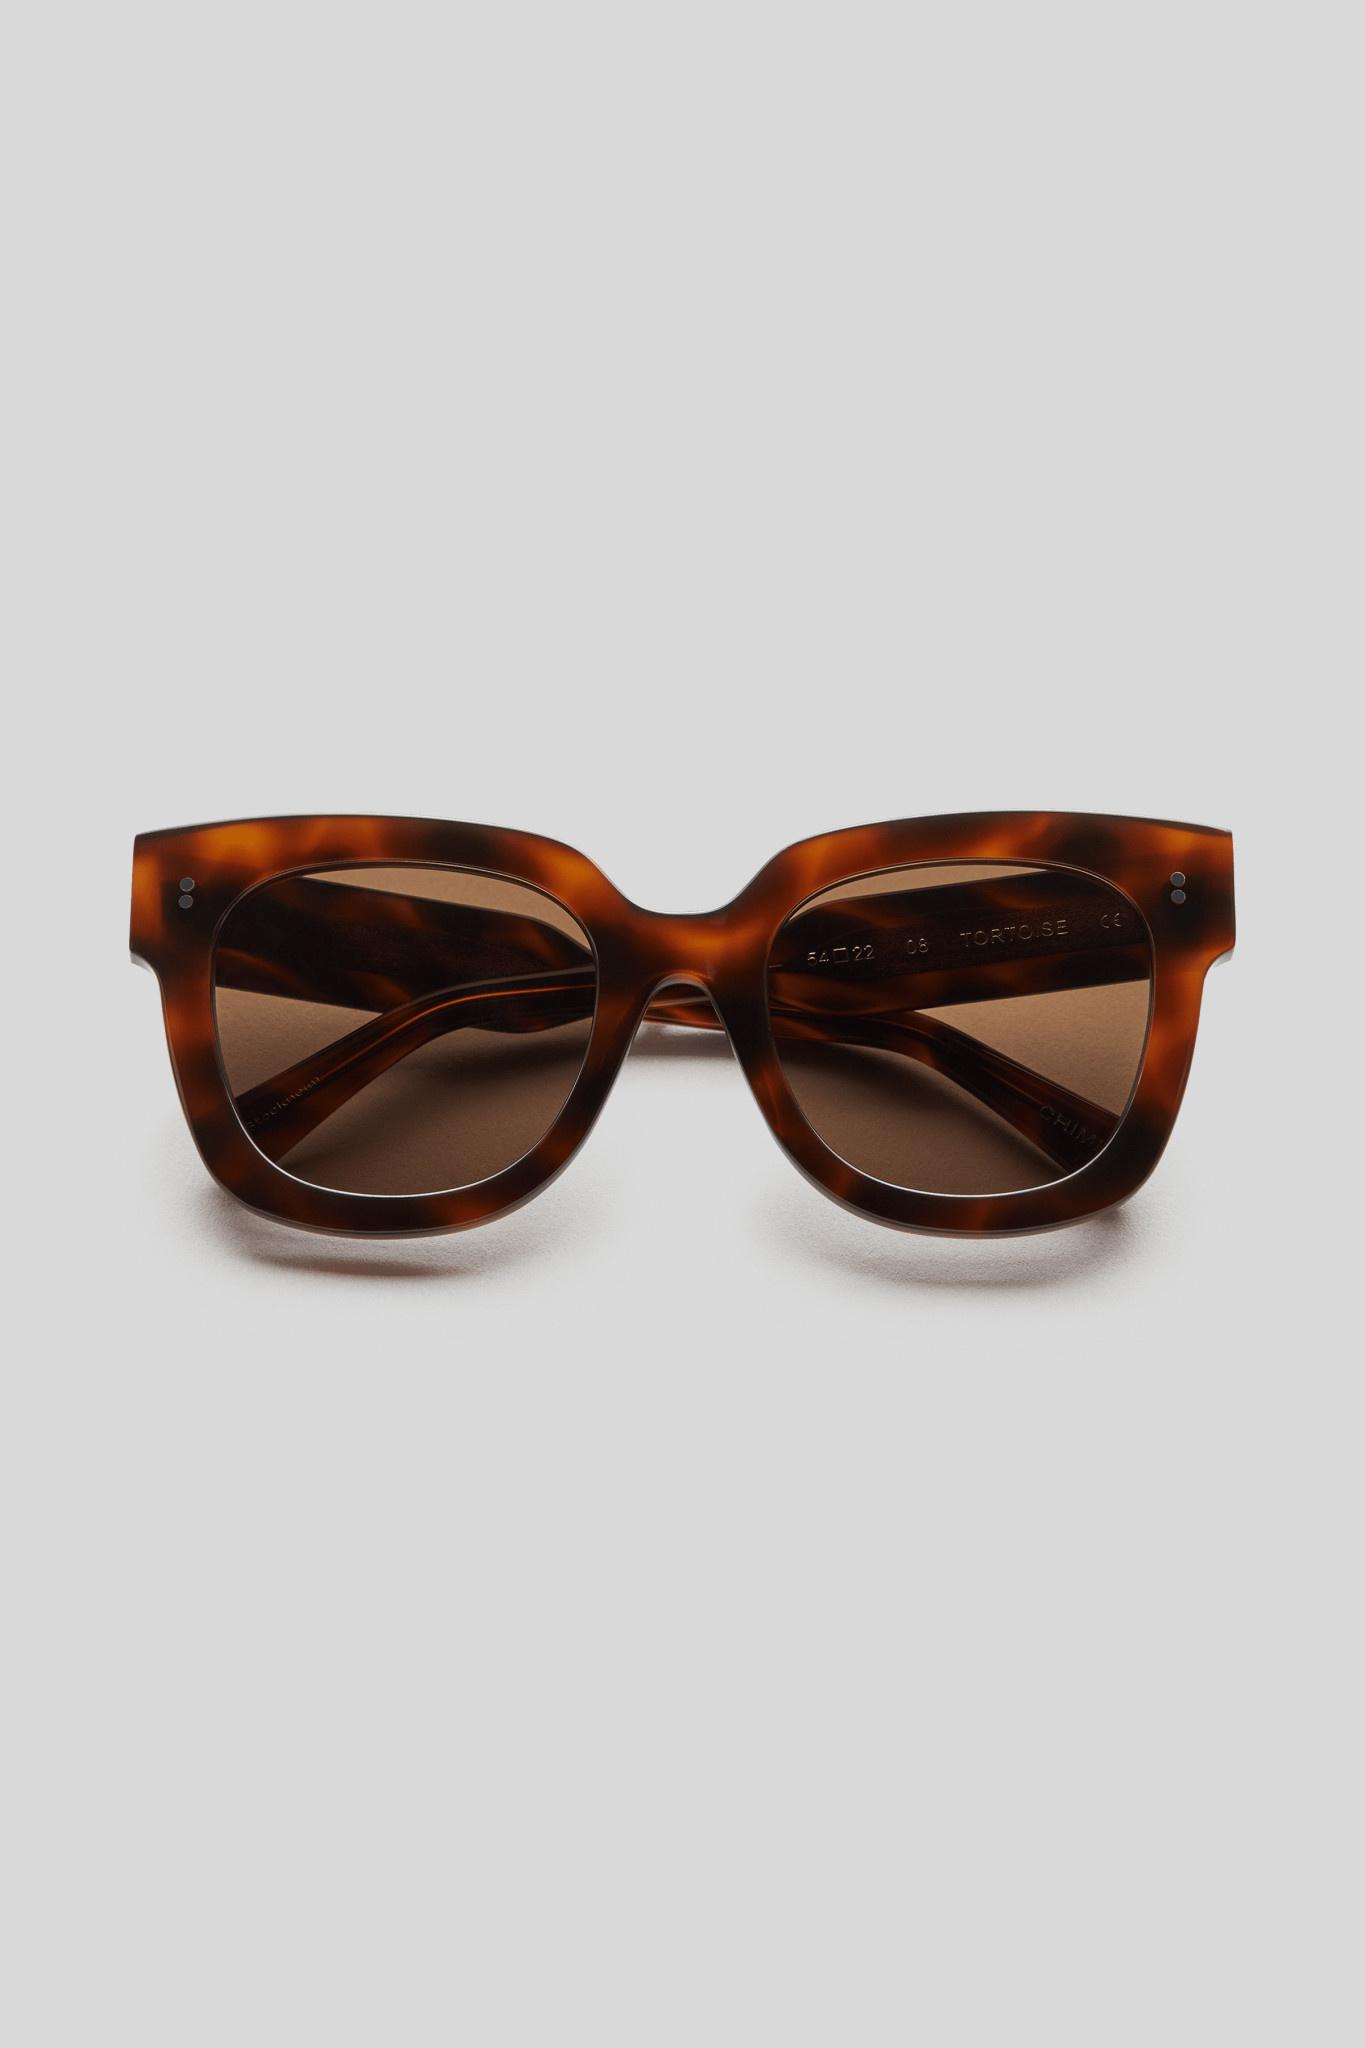 Sunglasses 08 - Tortoise-1